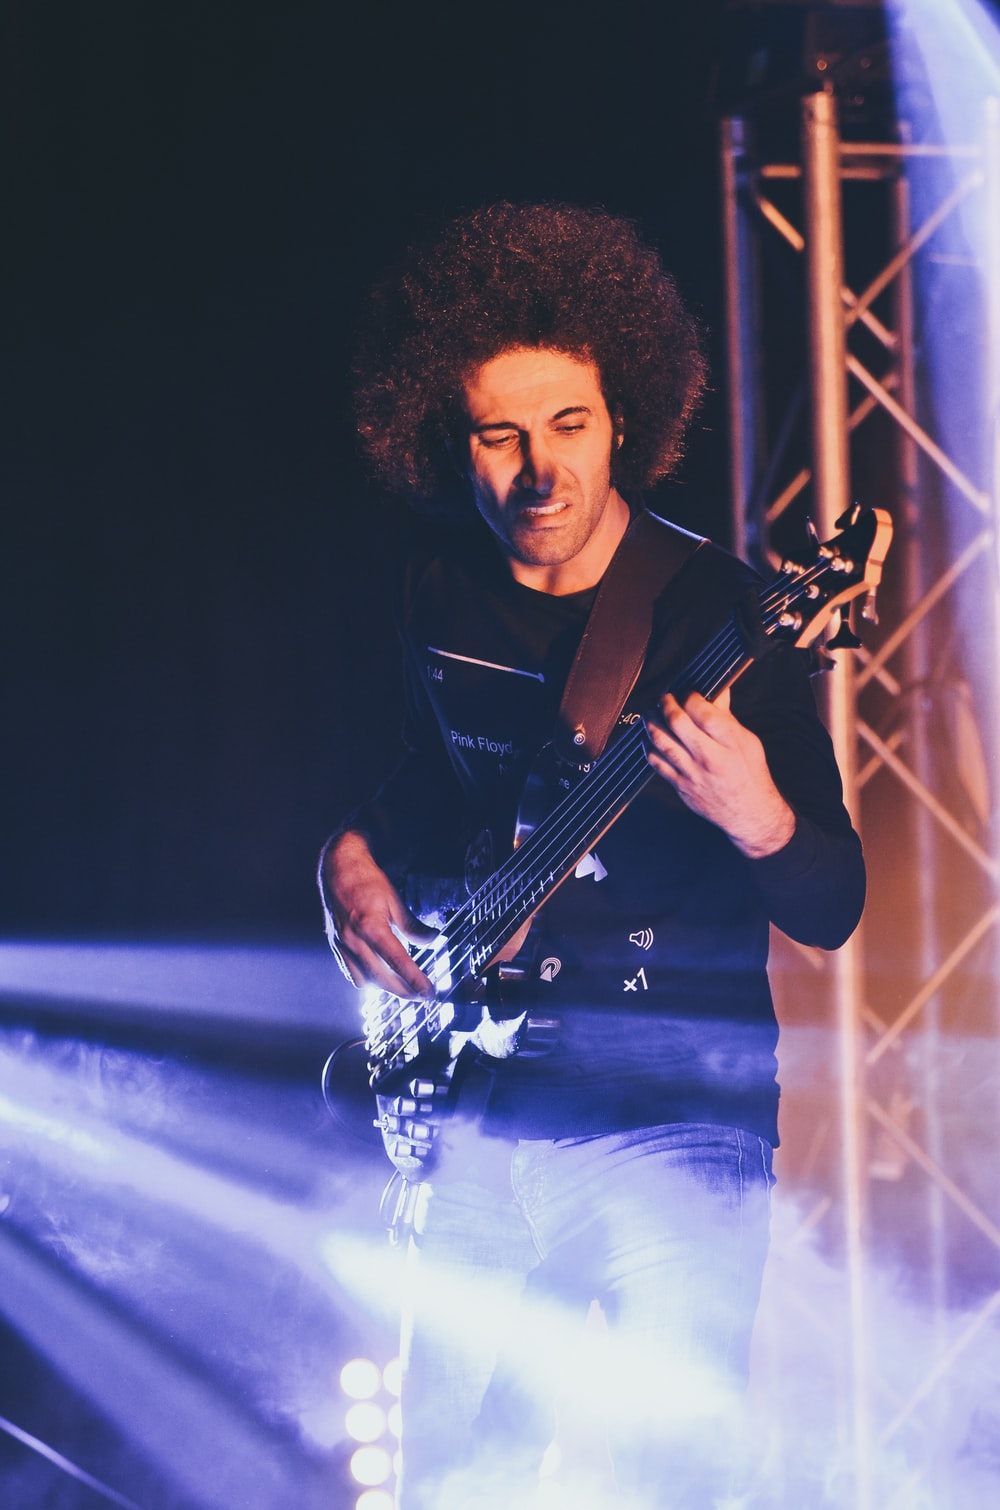 man in black button up shirt playing guitar